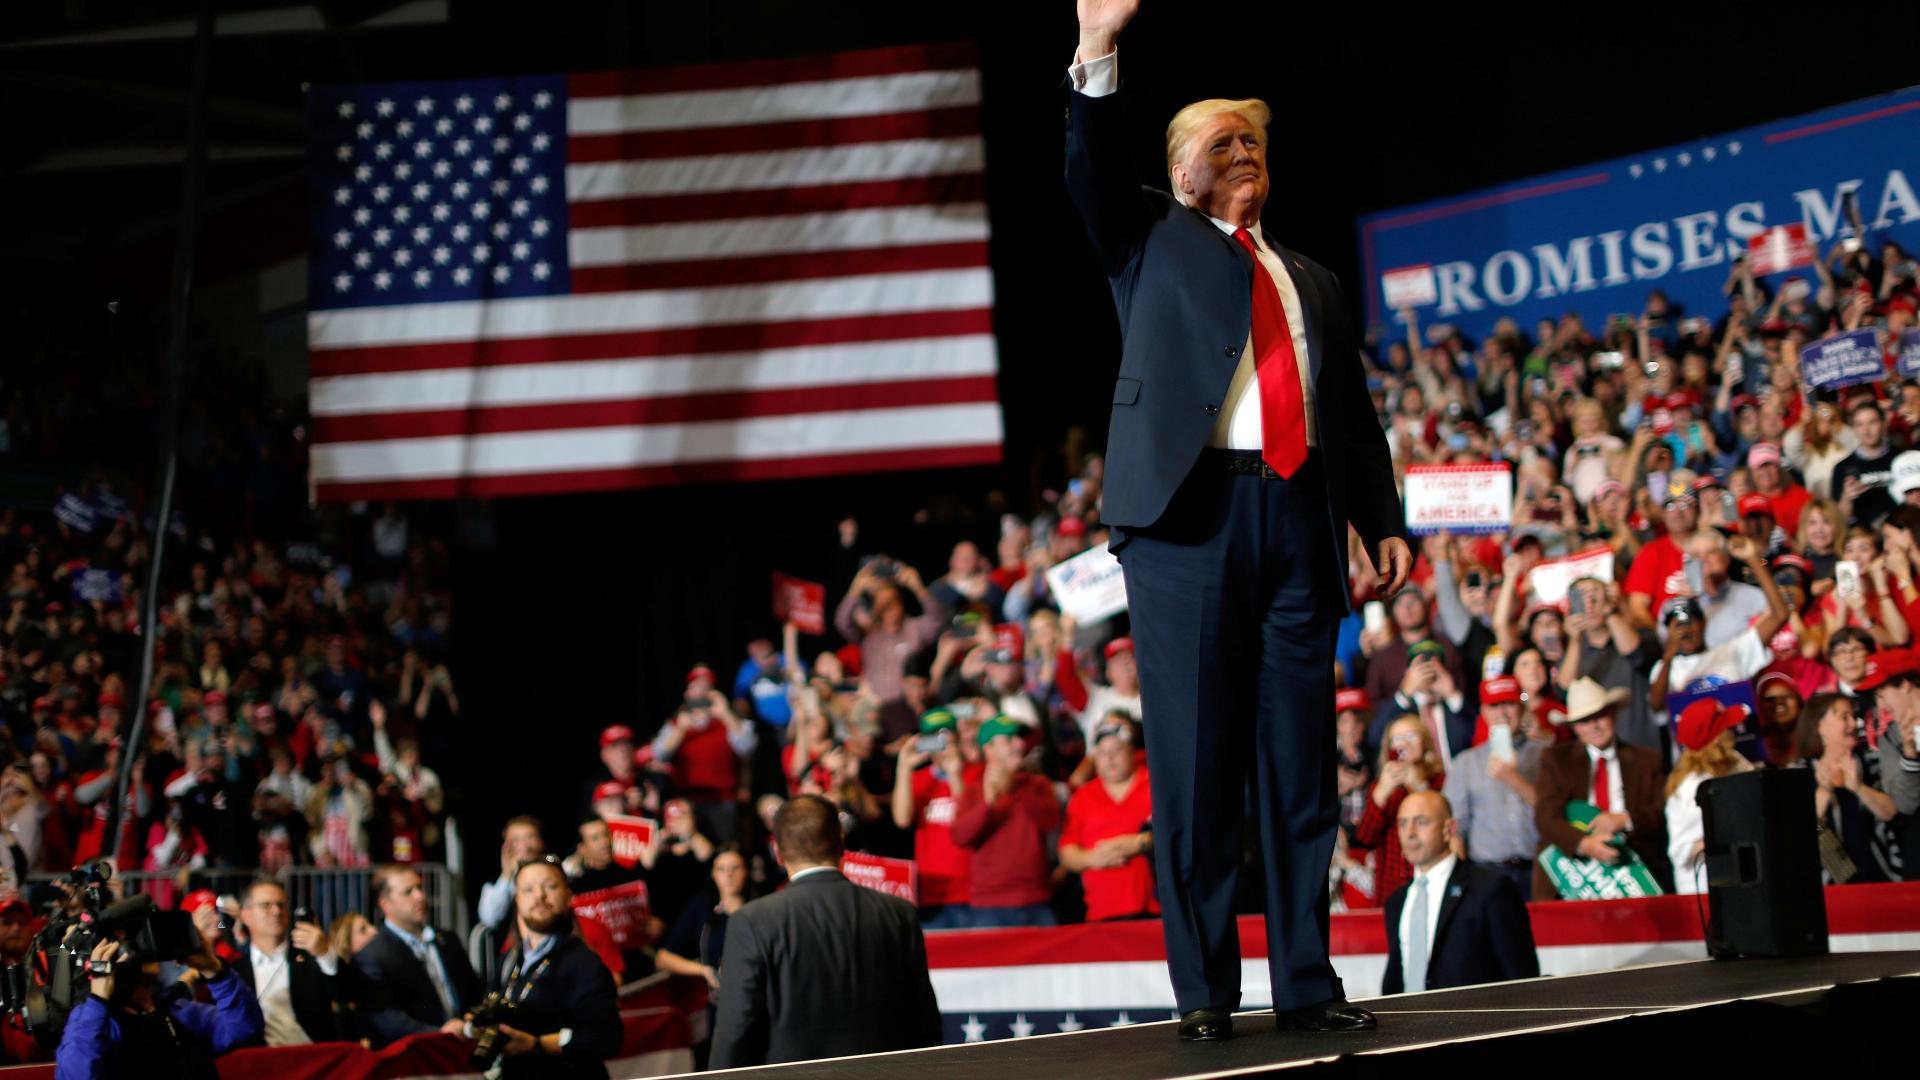 President Trump's crowd-size estimates: Increasingly unbelievable